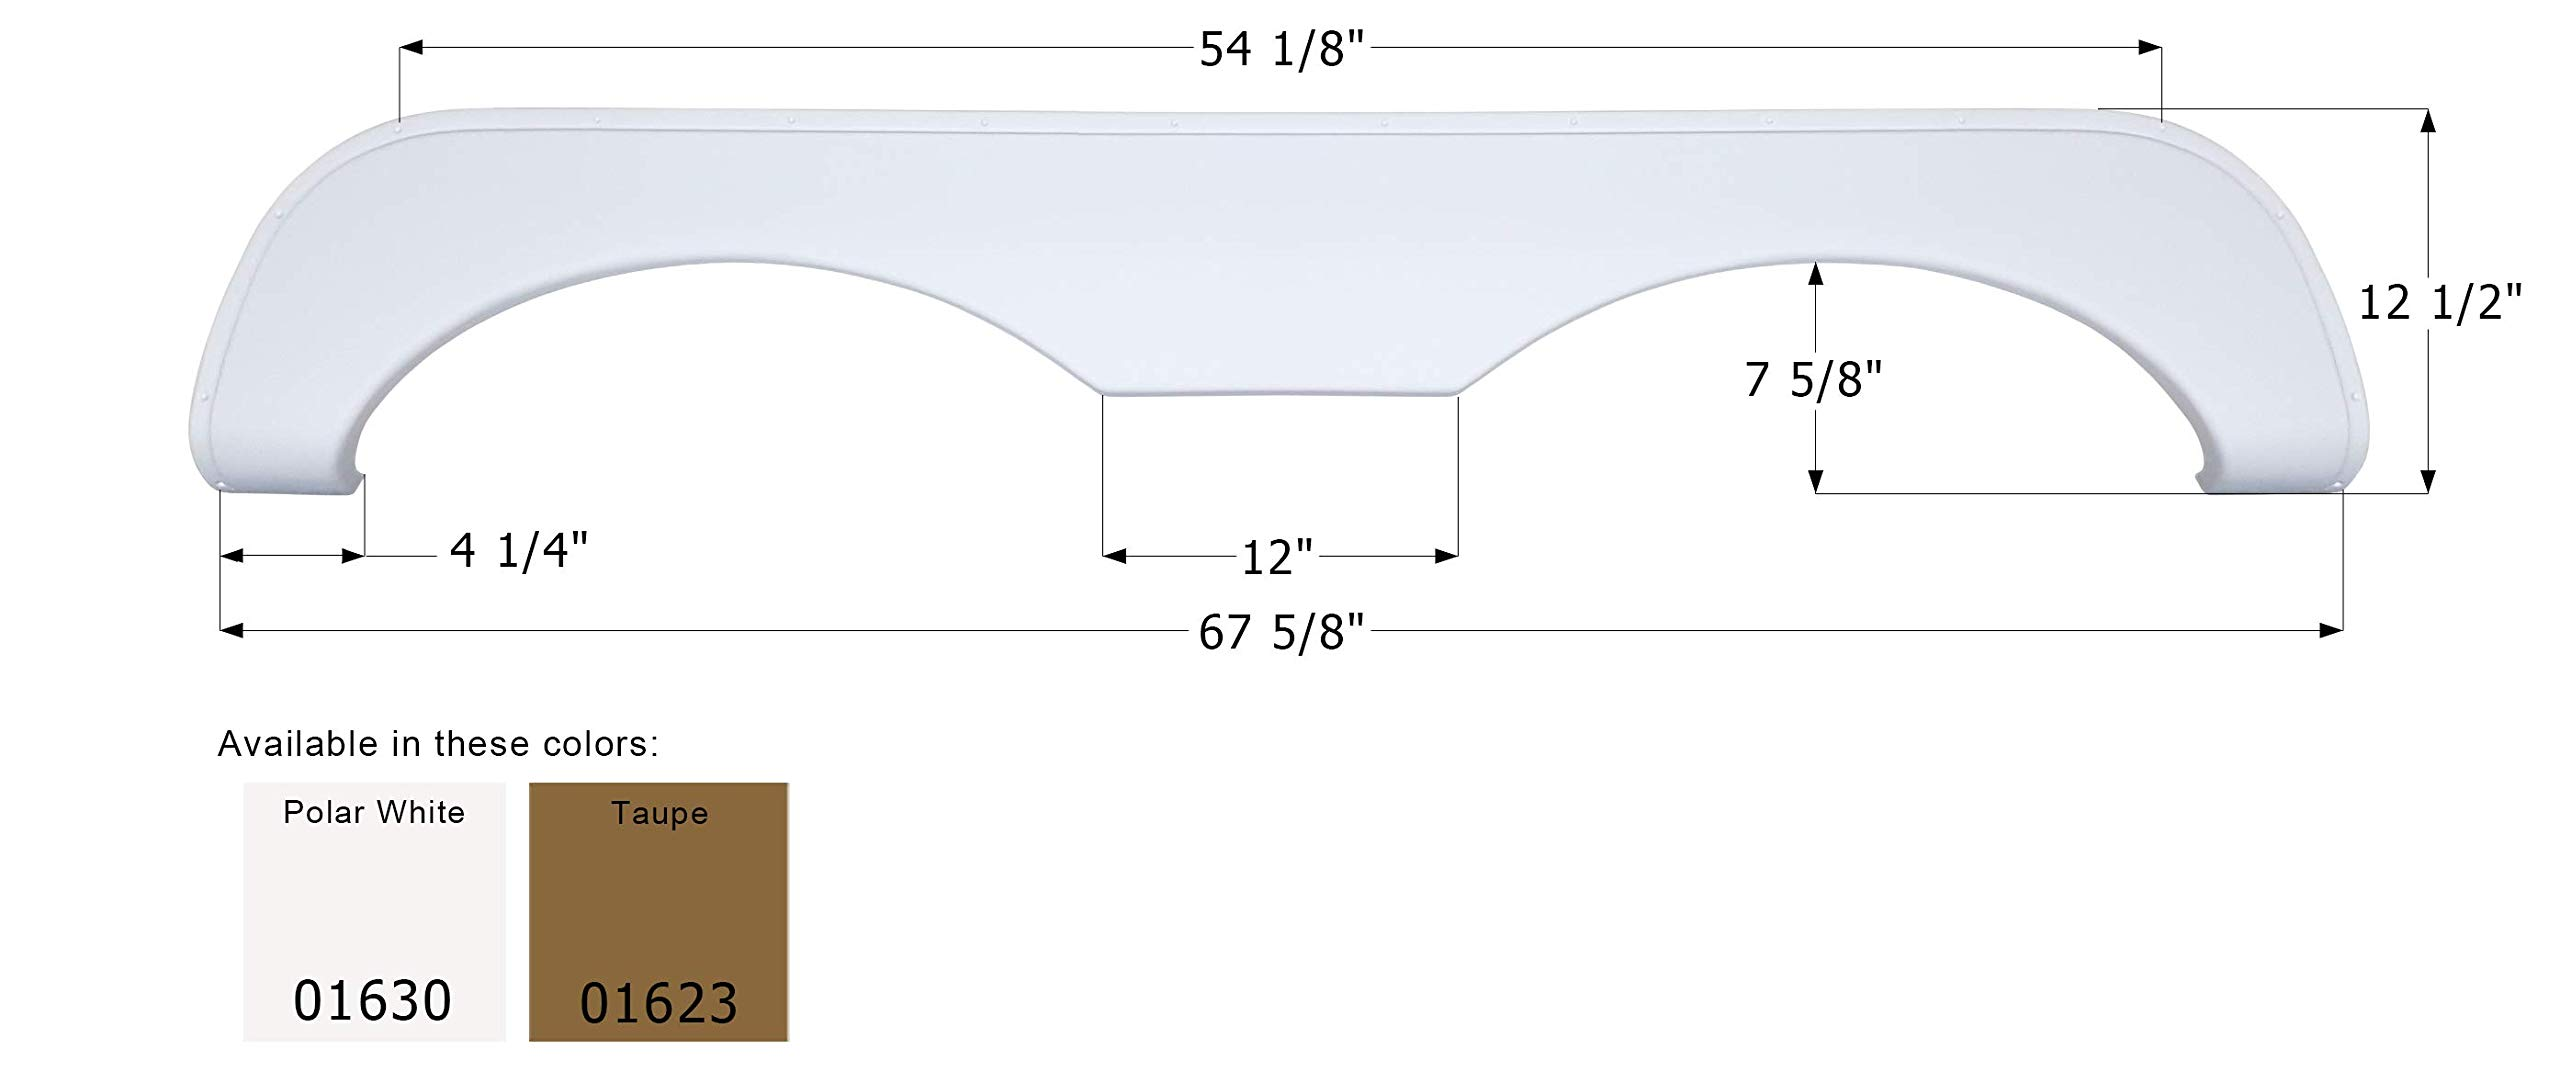 ICON 01630 Tandem Axle Fender Skirt for McKenzie-Polar White by ICON